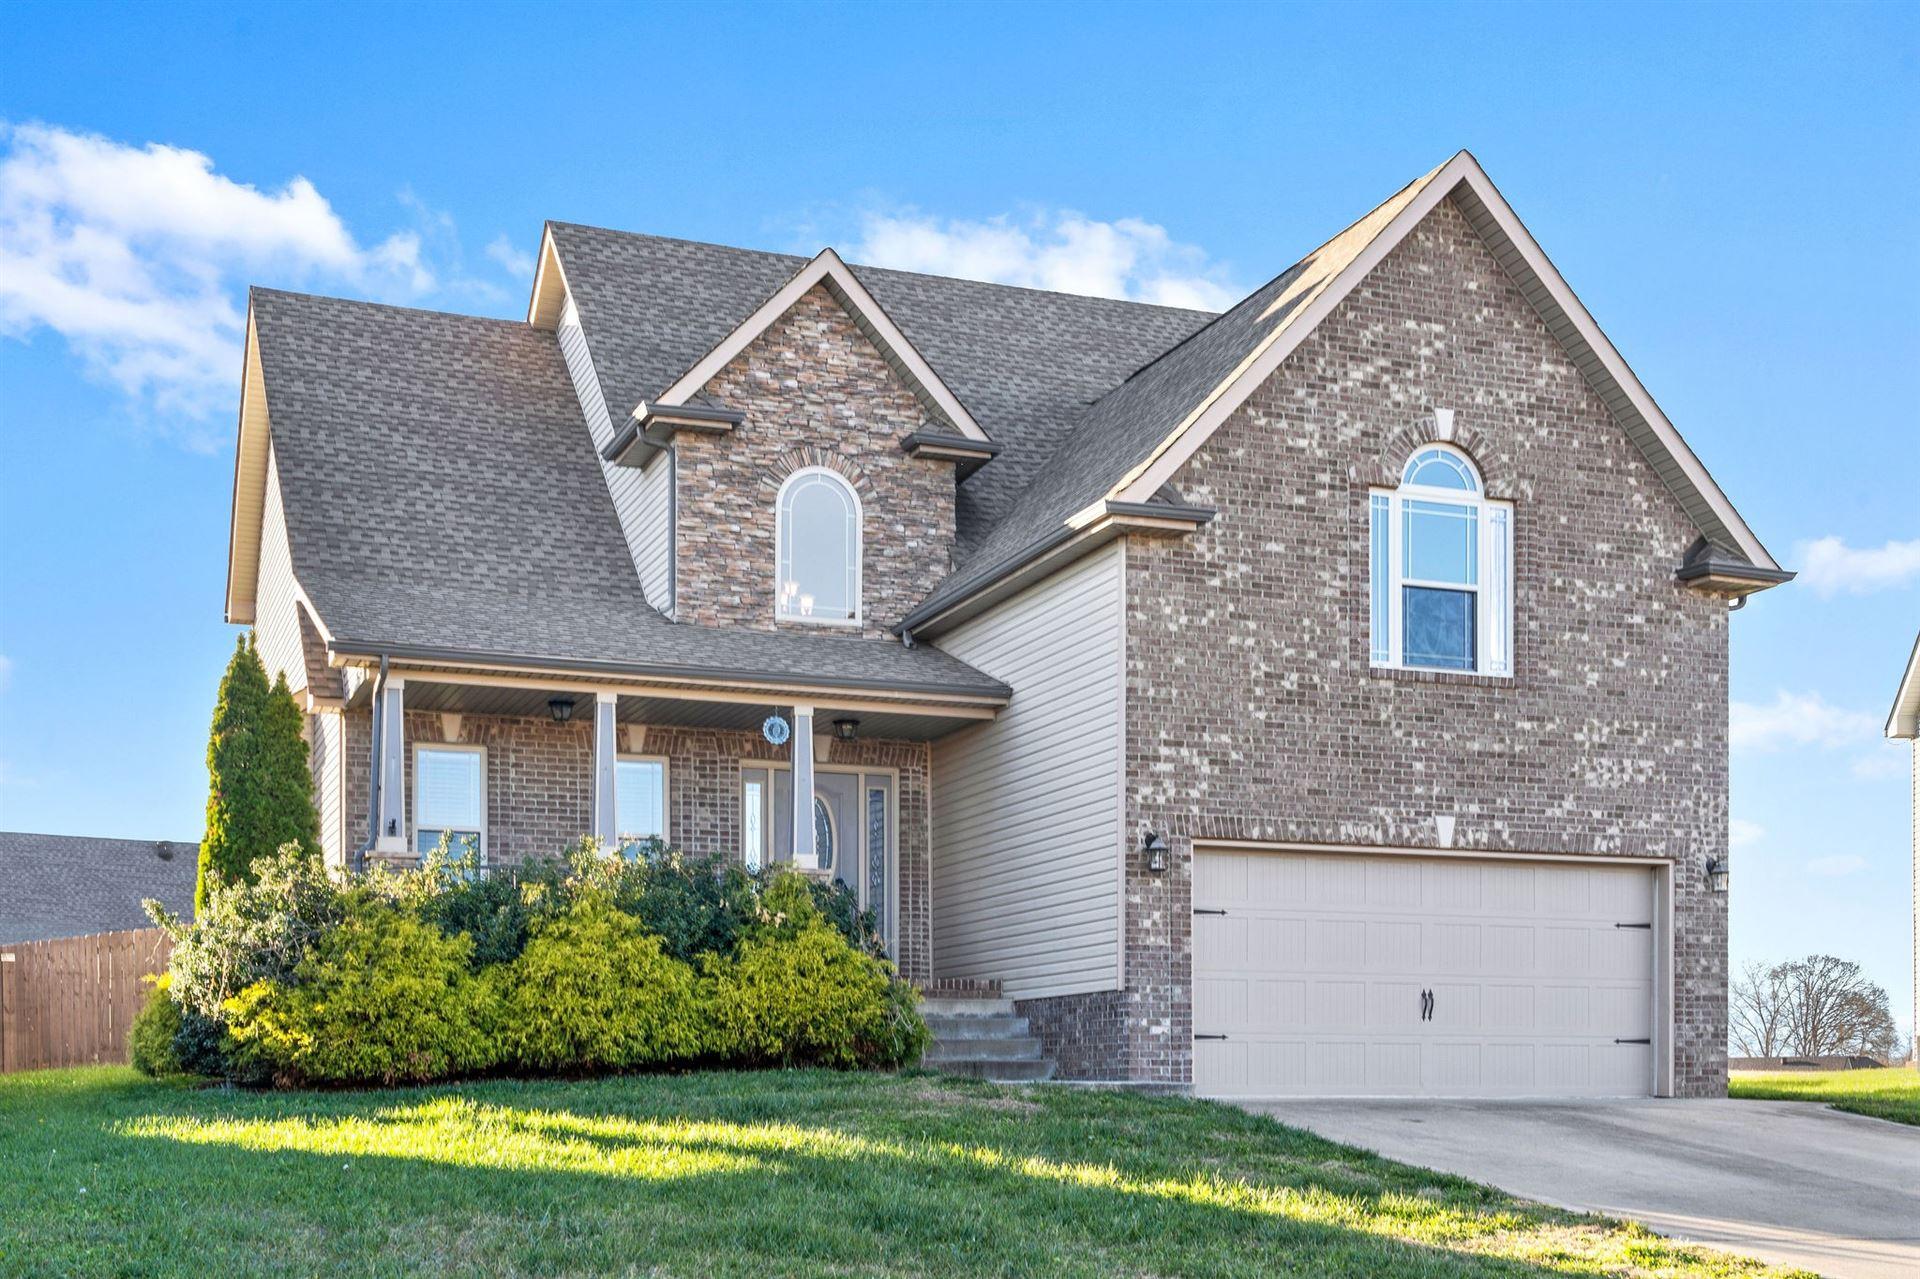 1792 Arrowhead Ct, Clarksville, TN 37042 - MLS#: 2219751